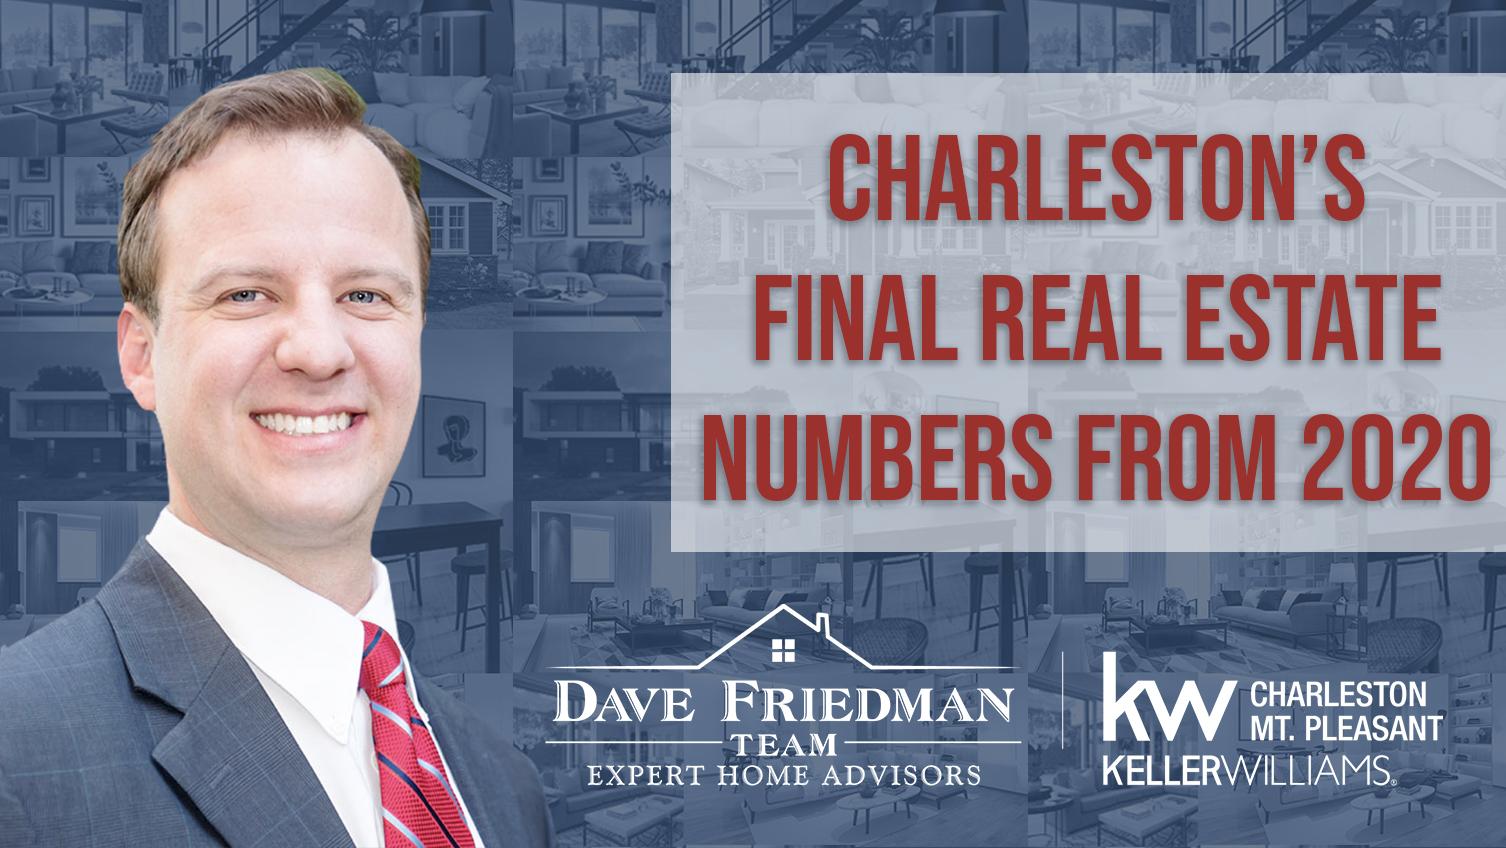 Charleston Real Estate Market Update for December 2020